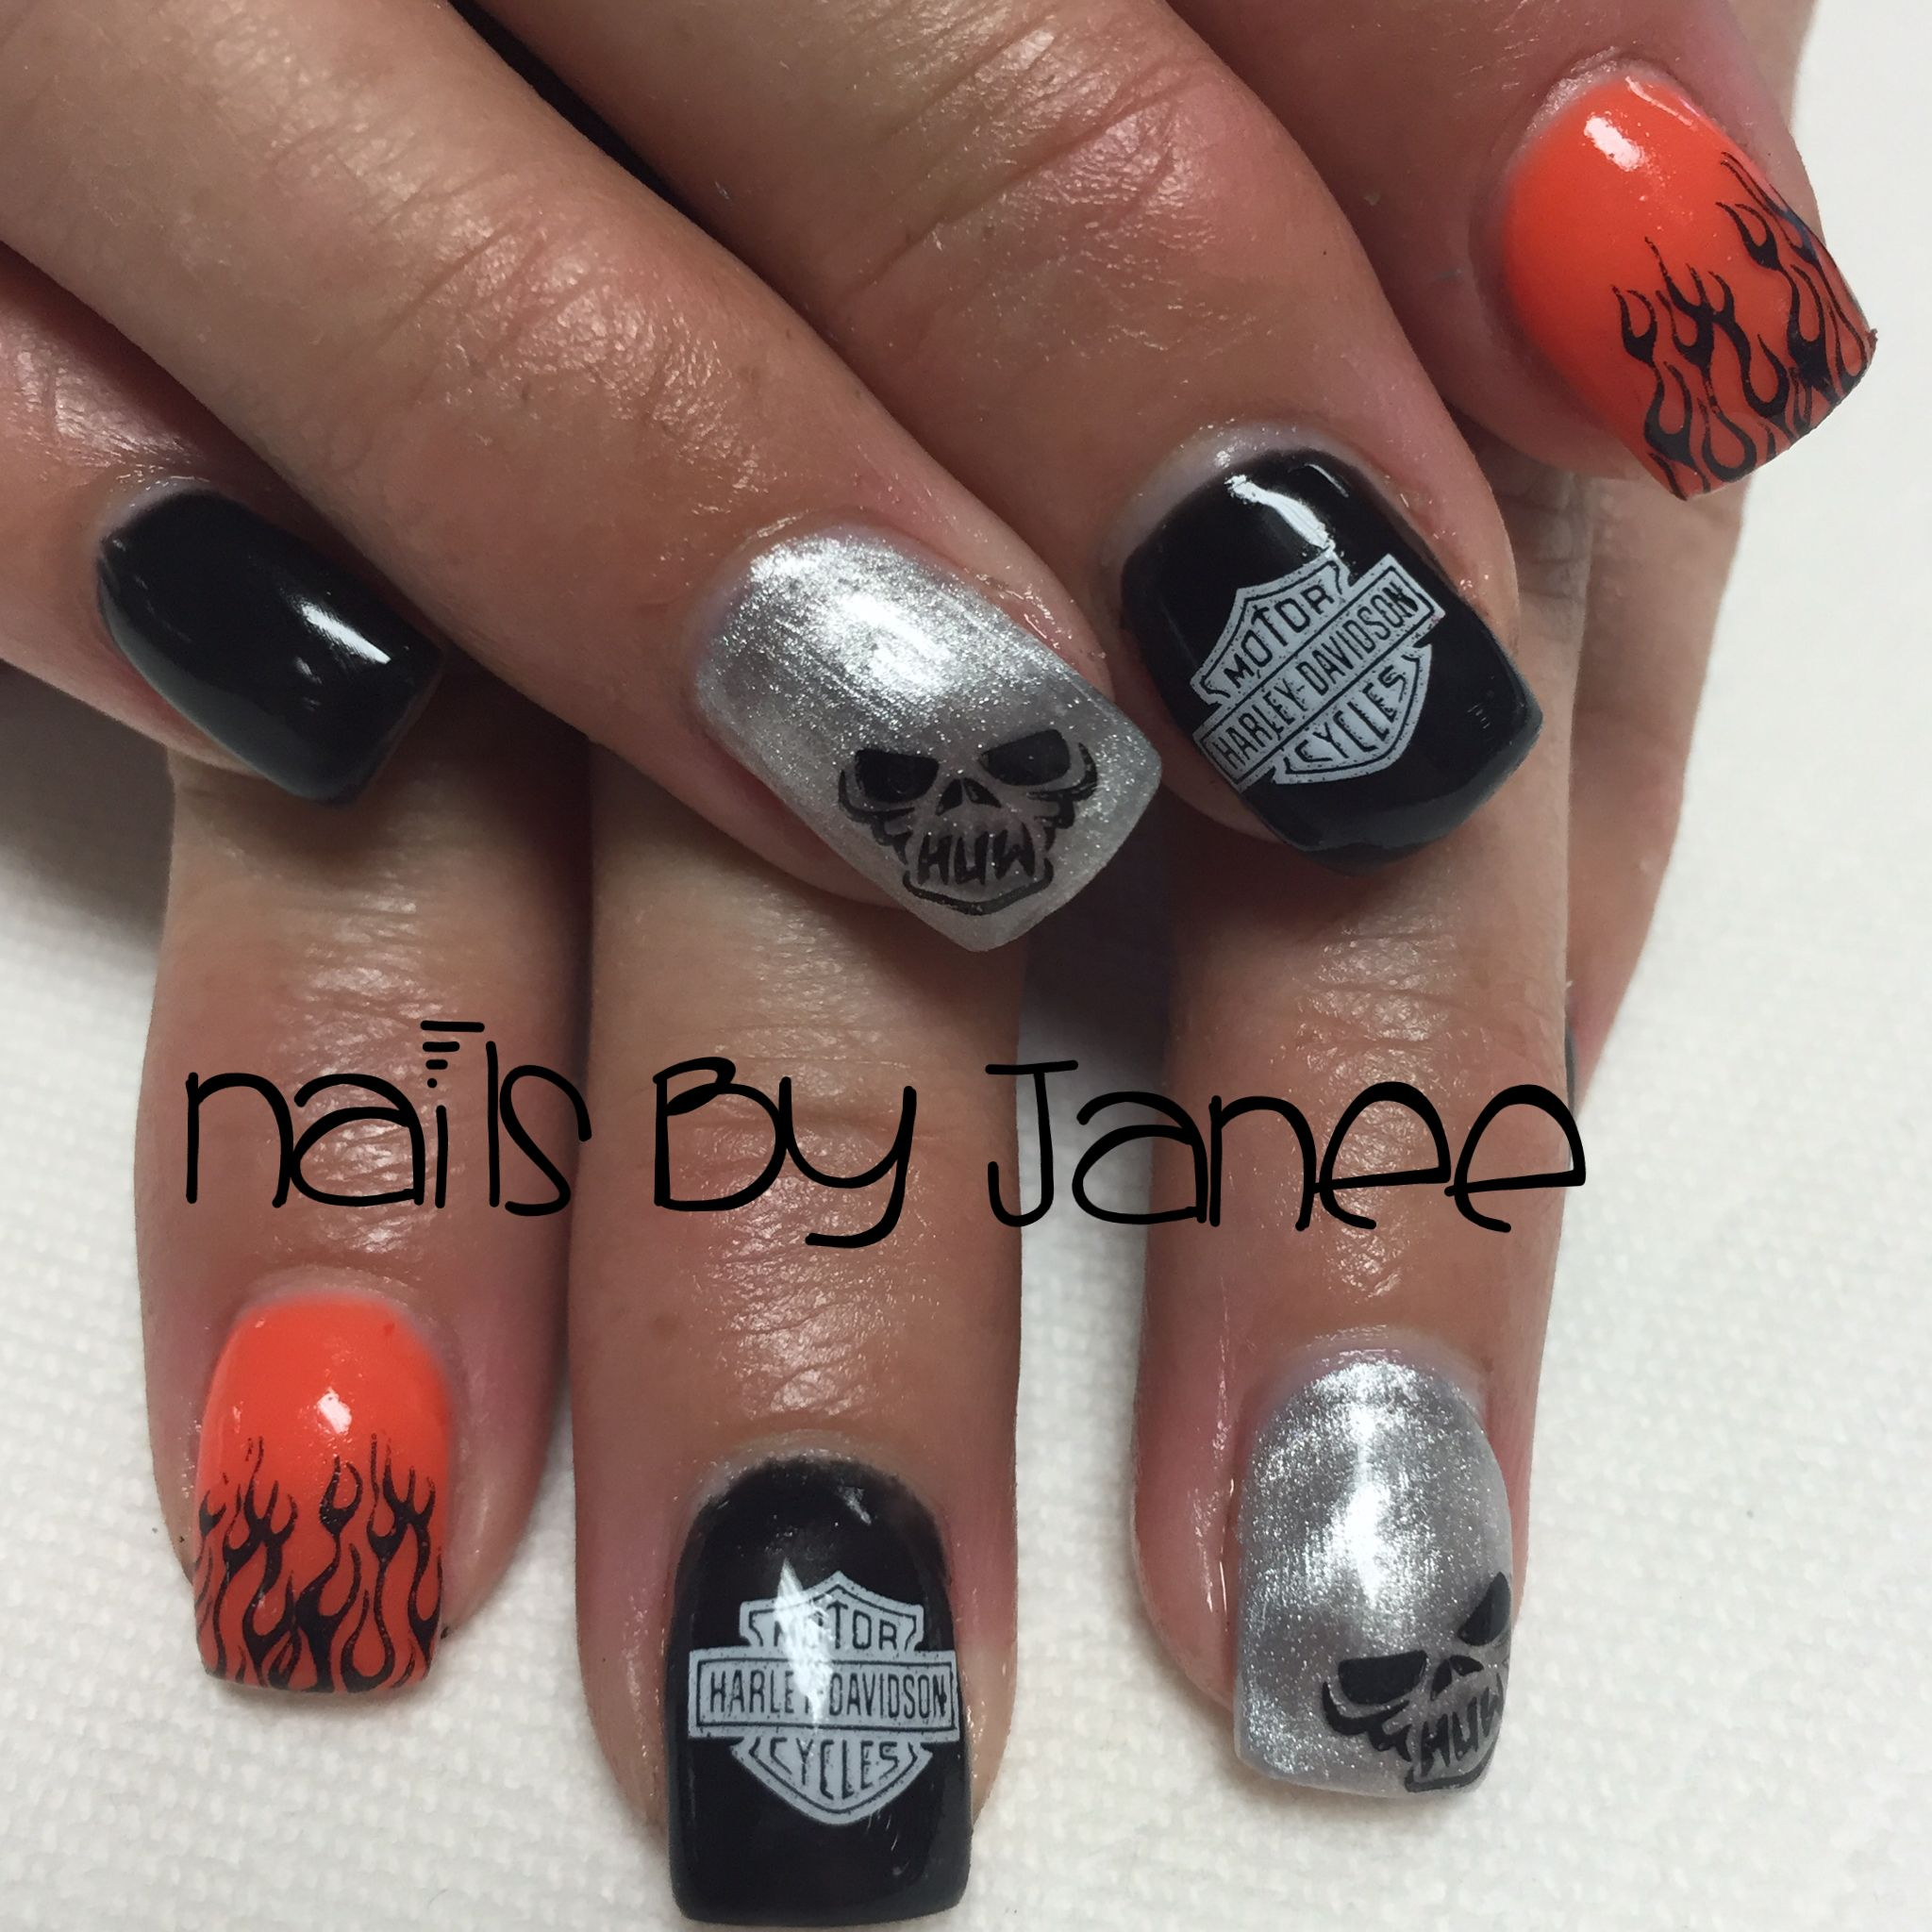 Harley Davidson Nails By Janee With Images Nails Beach Nails Beach Nail Designs